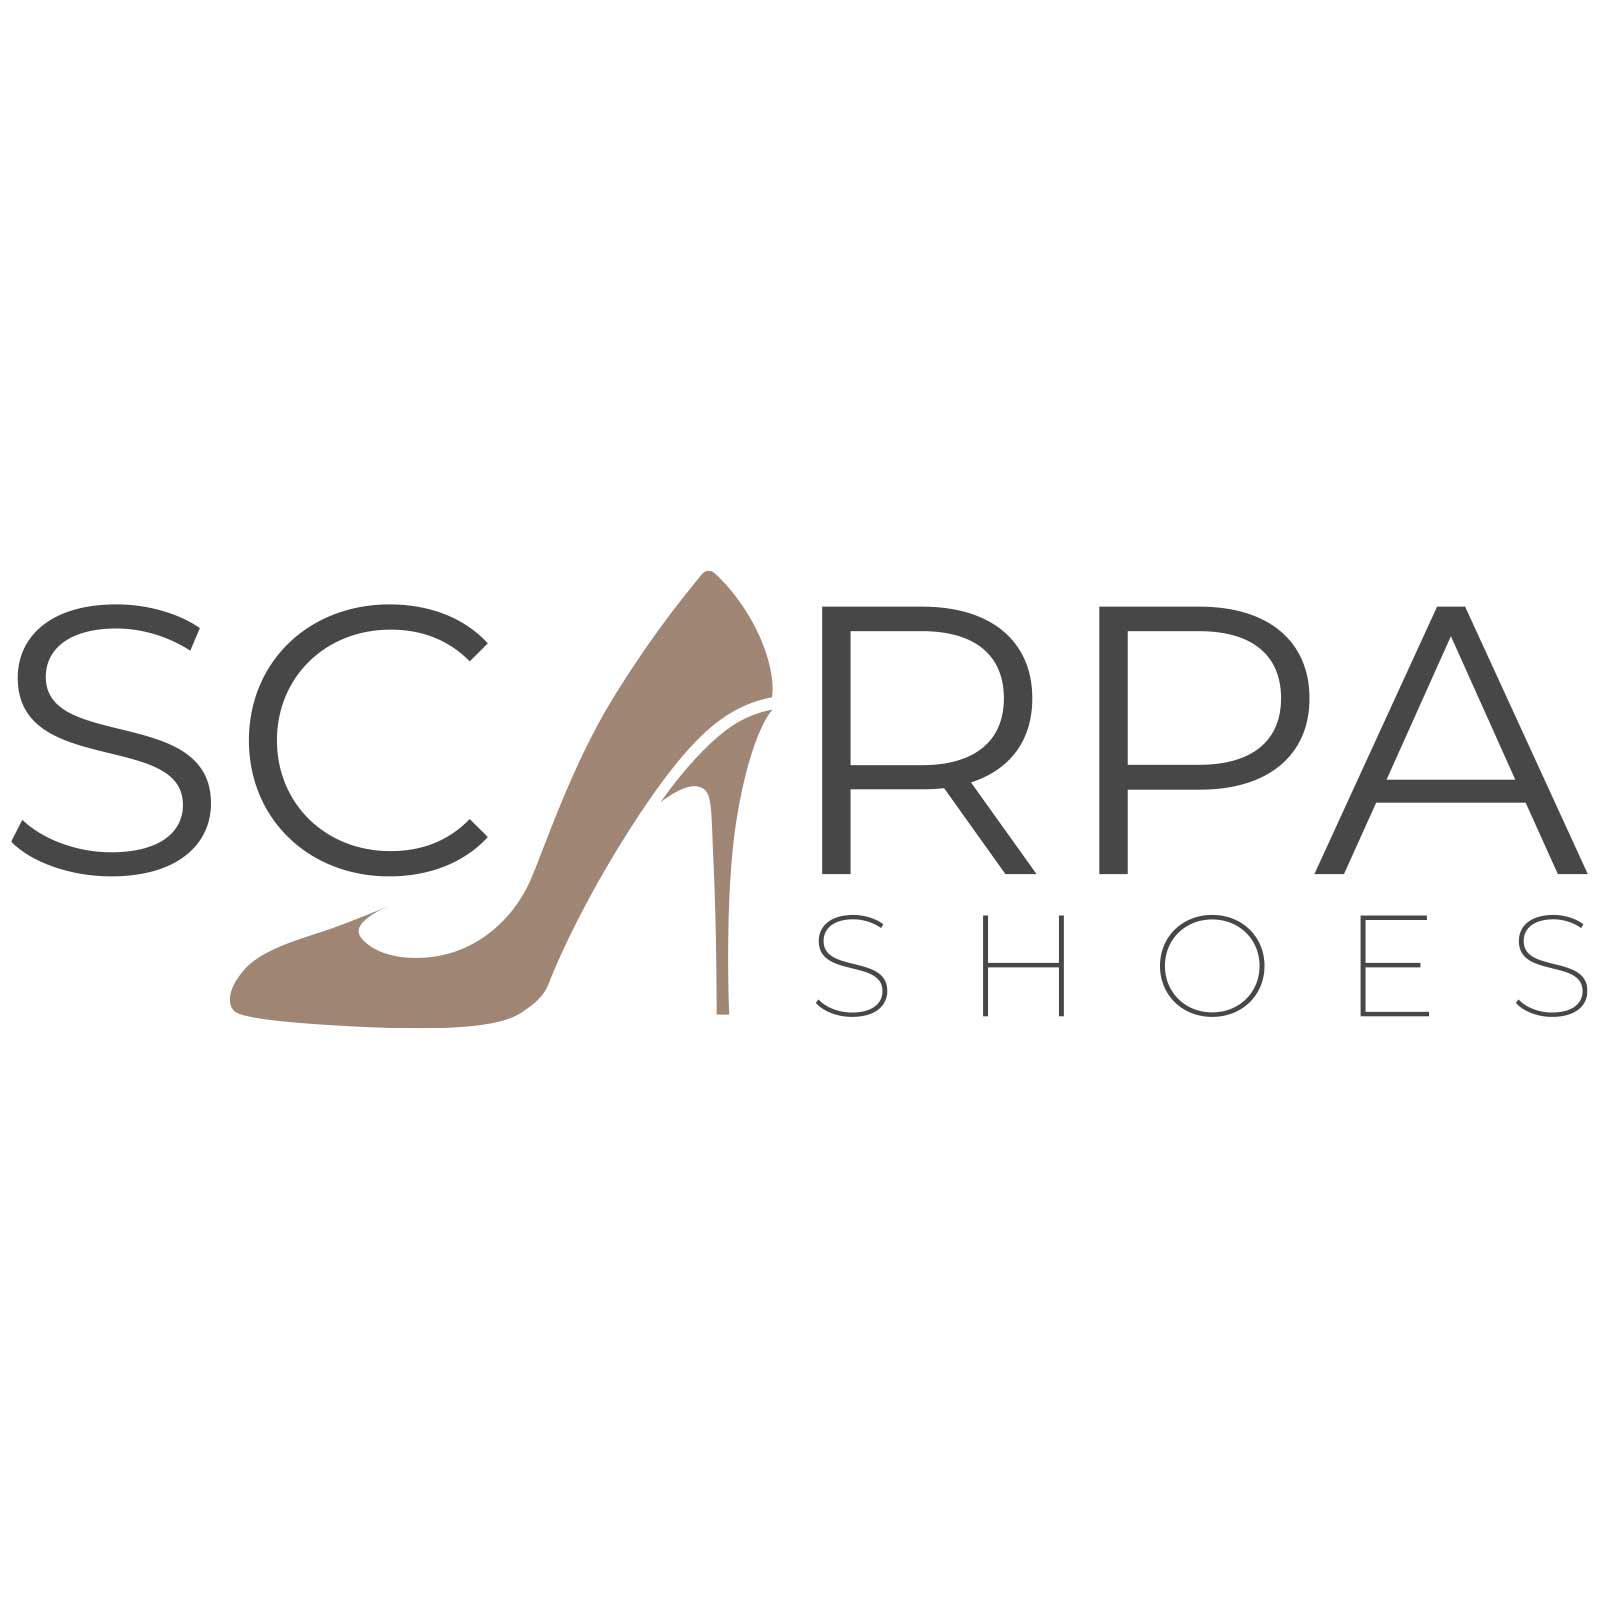 Scarpa Shoes Logo Kreation ShowMyProject